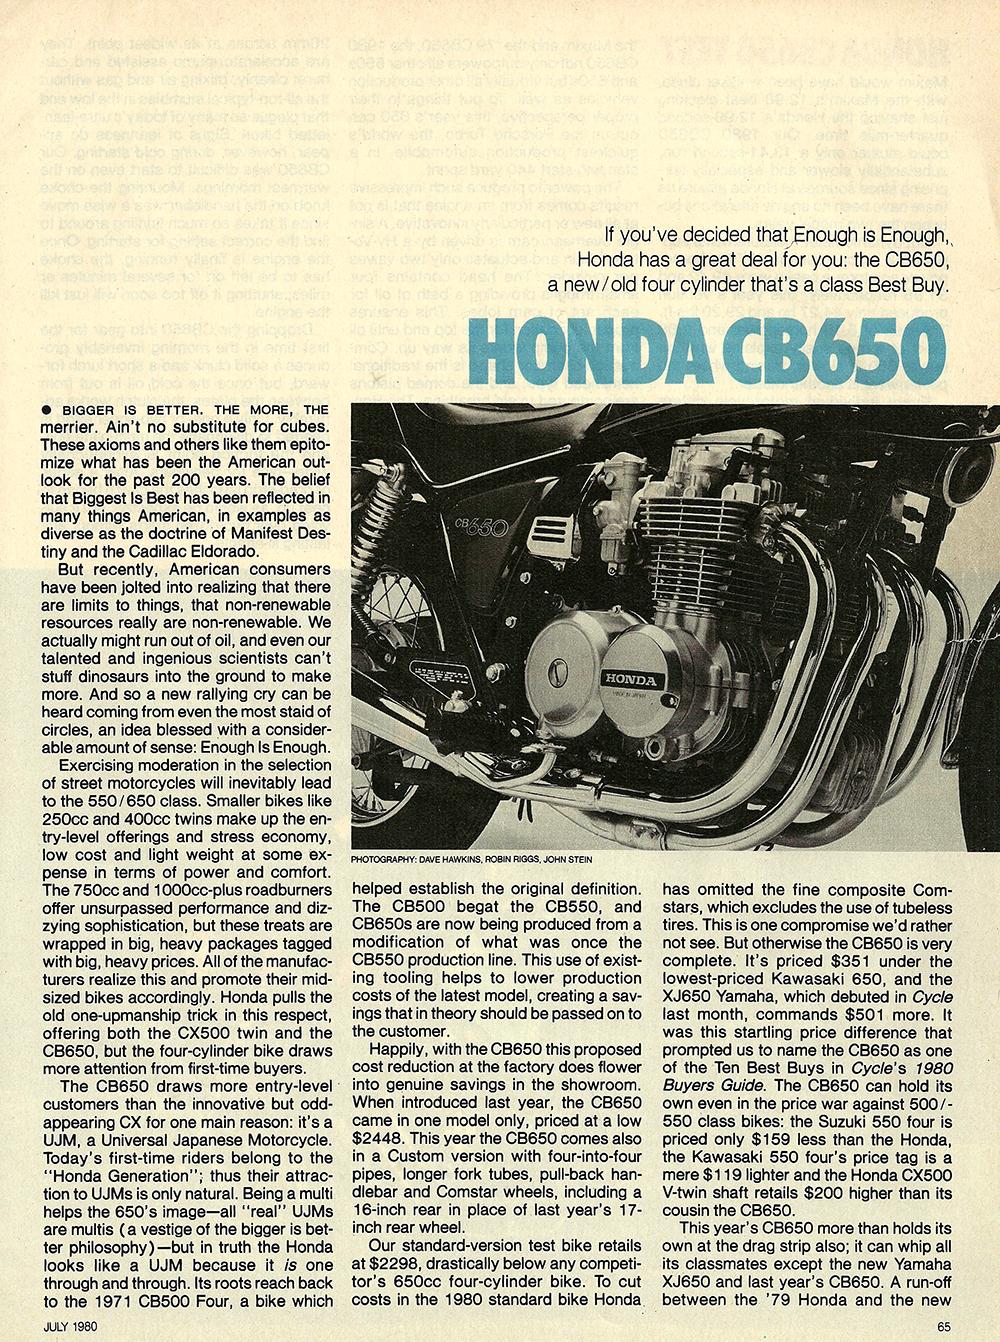 1980 Honda CB650 road test 02.jpg